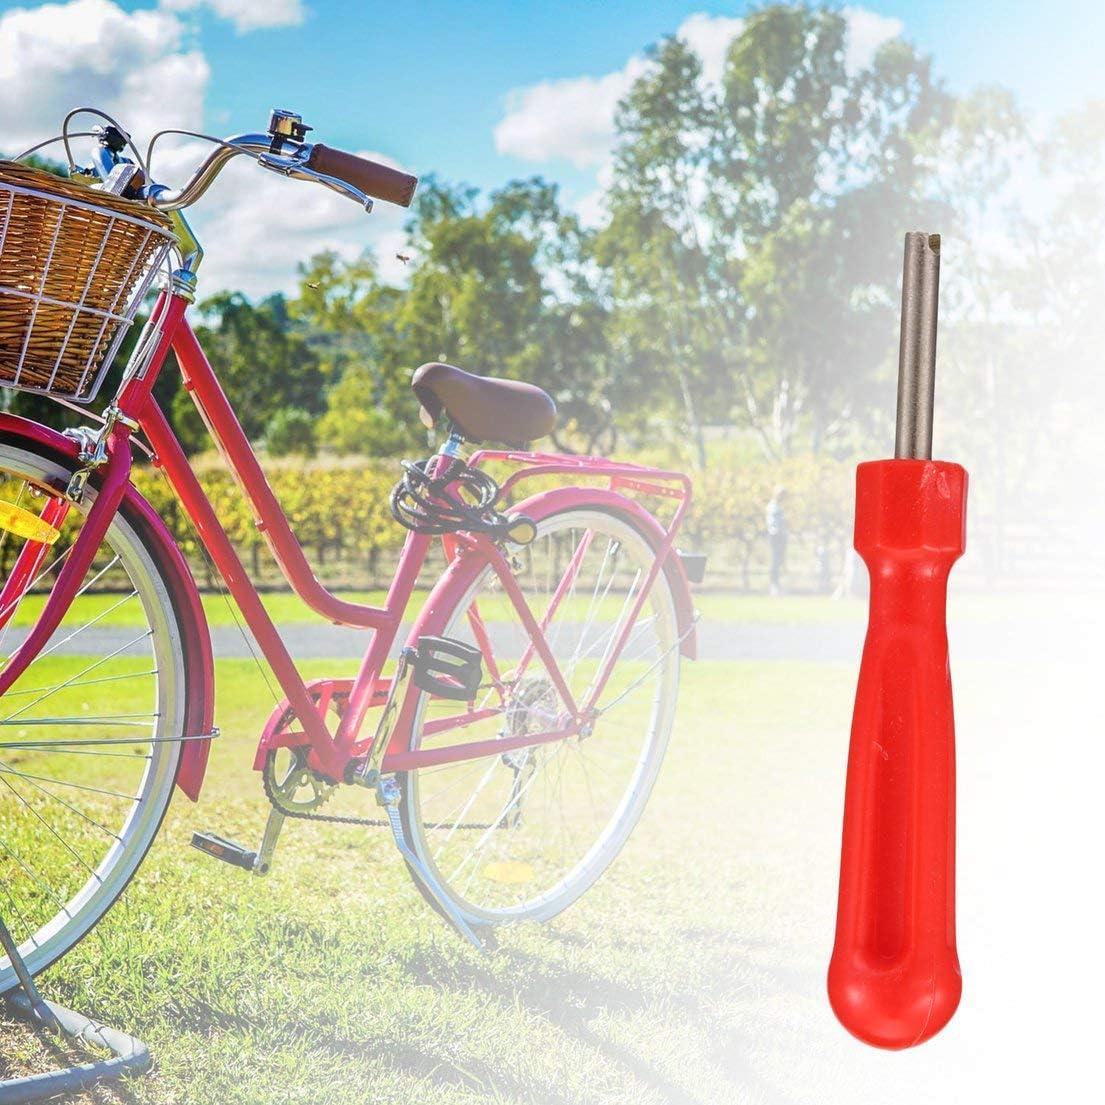 SKYYKS Tyre Valves Stem Repair Tools Car Tire Valve Core Remover Removal Inner Tube Key Car Bike Bicycle Cycle Tool